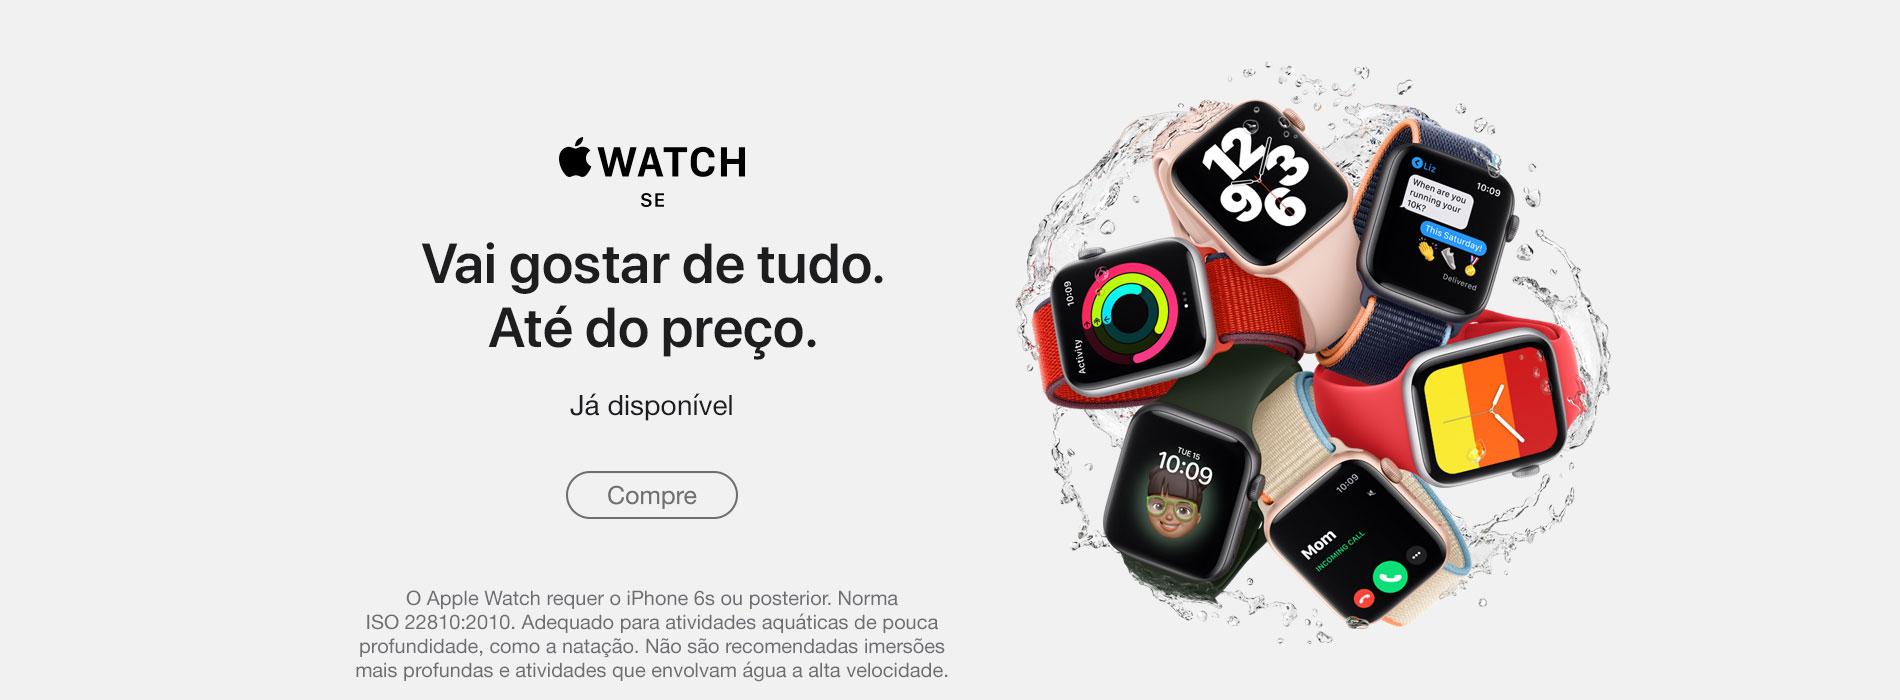 Homepage Slideshow - Watch SE